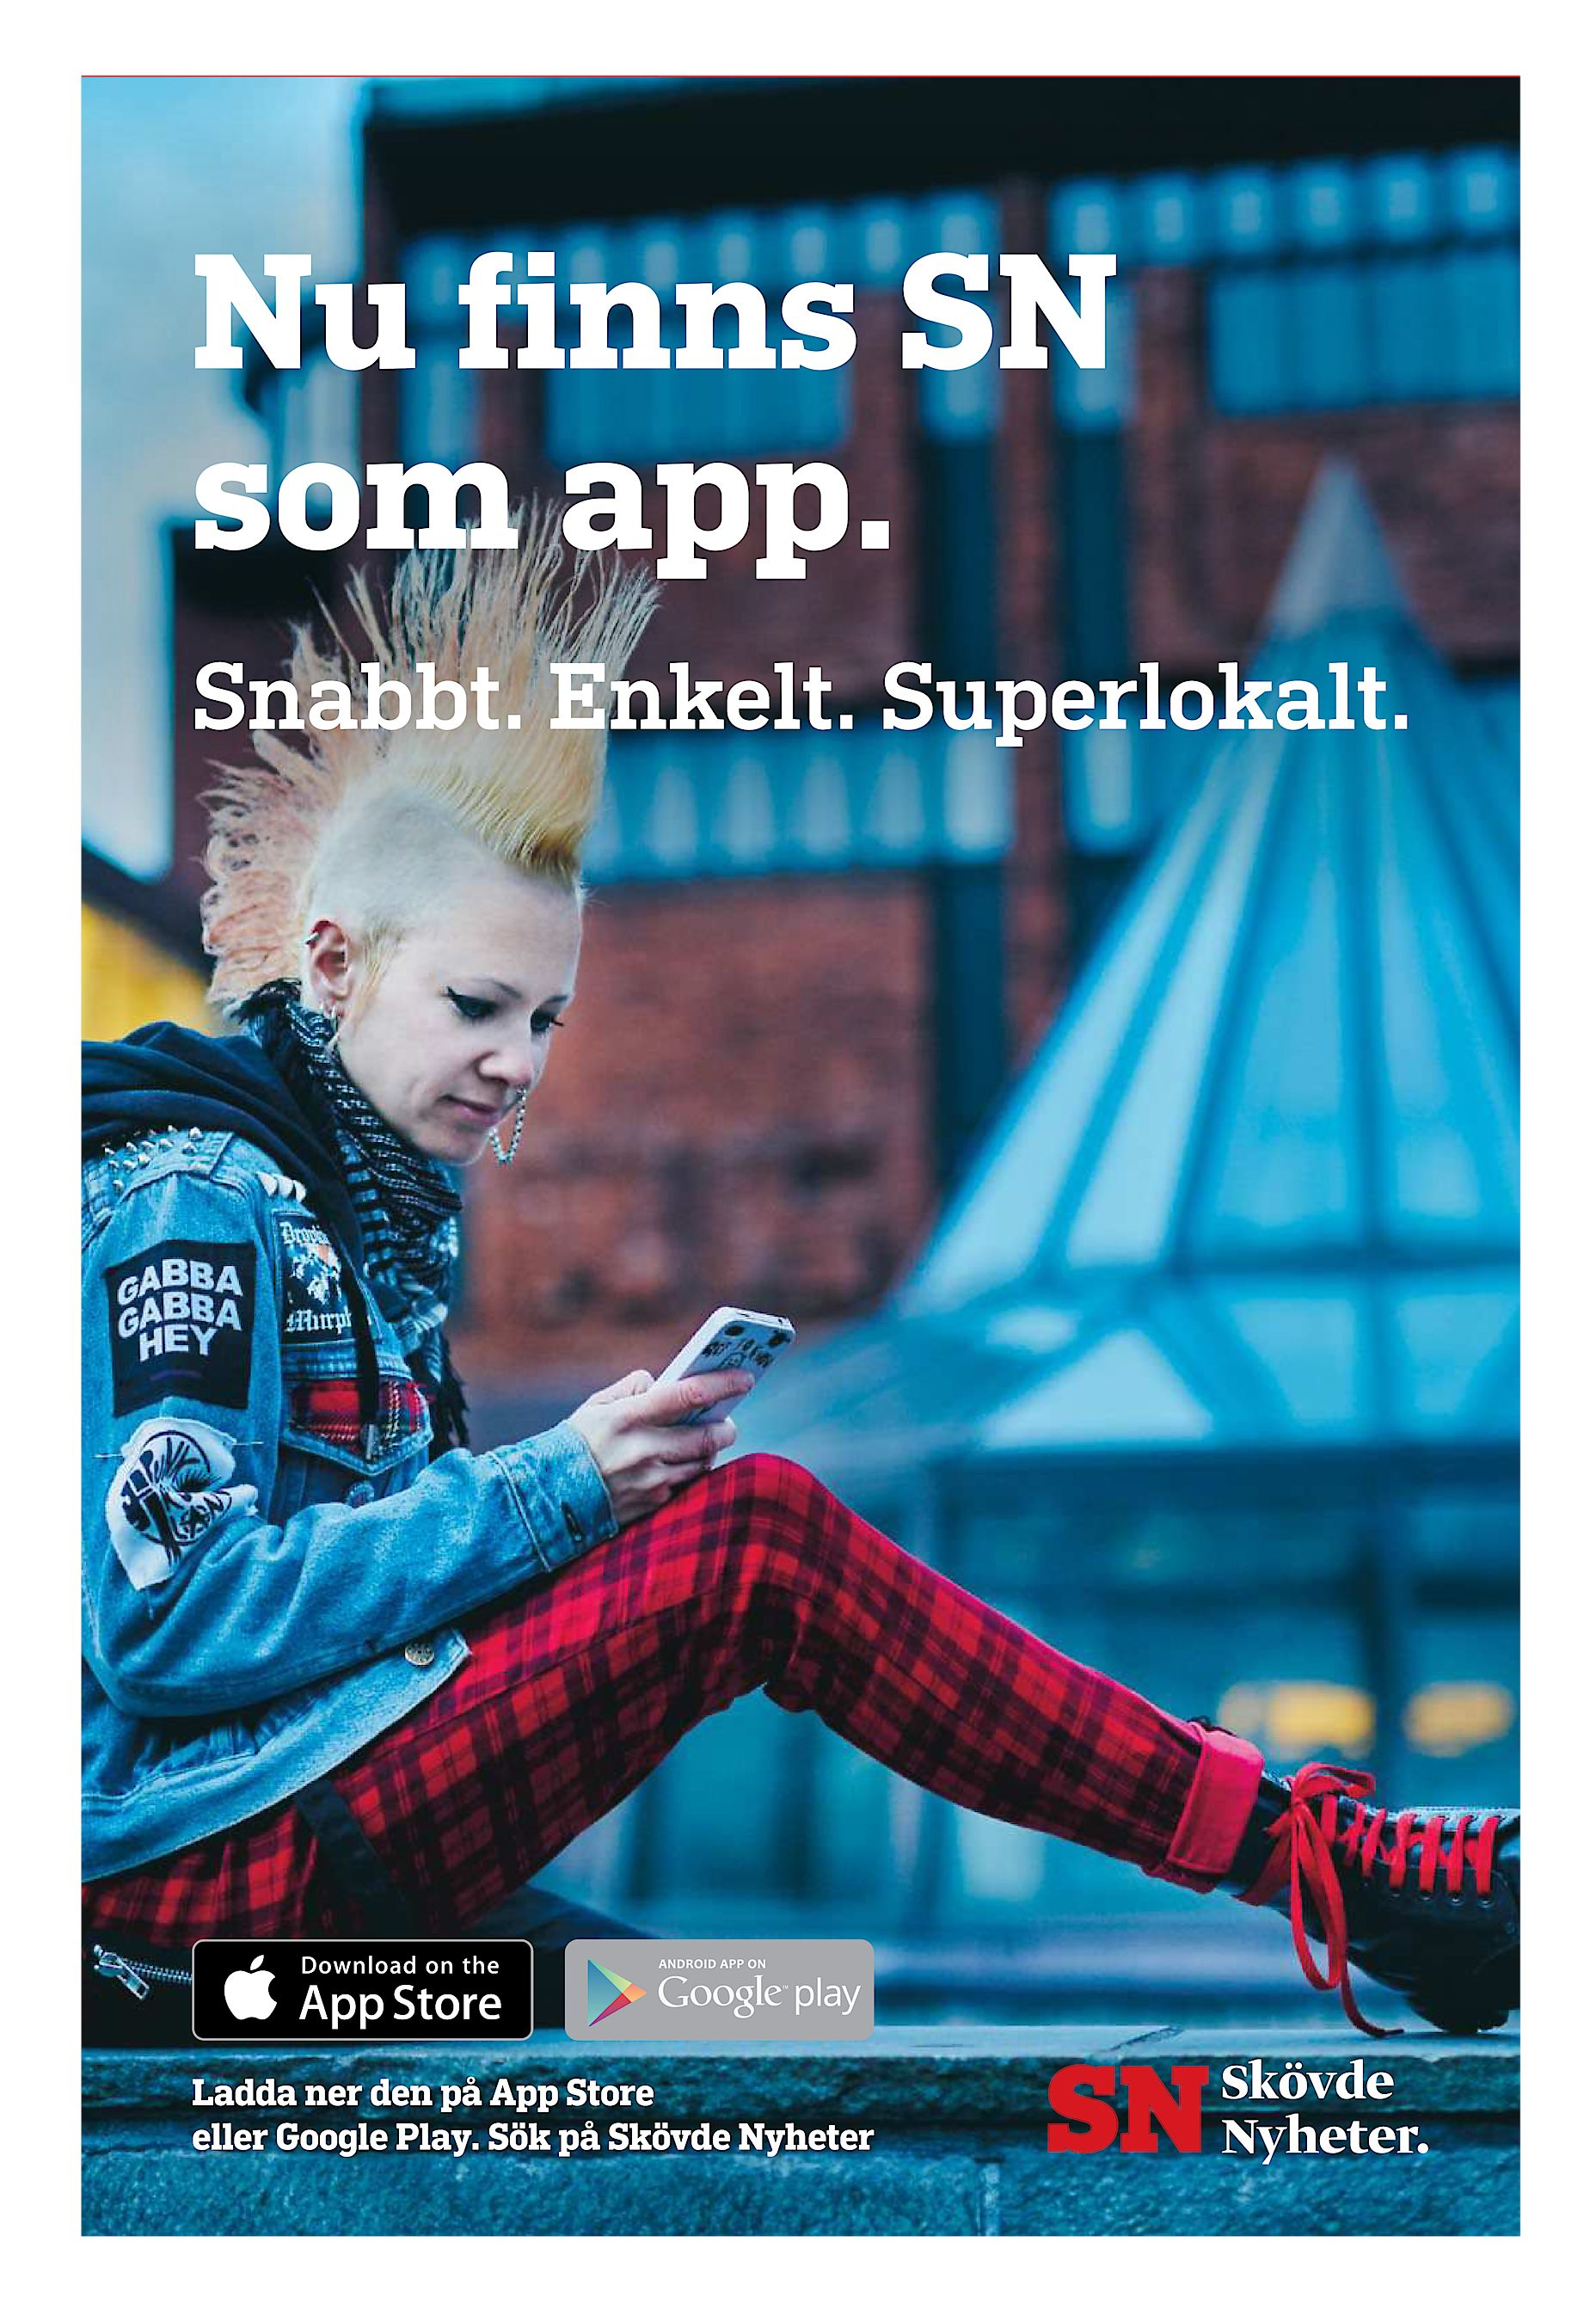 Skövde Nyheter SN-20160908 (endast text)